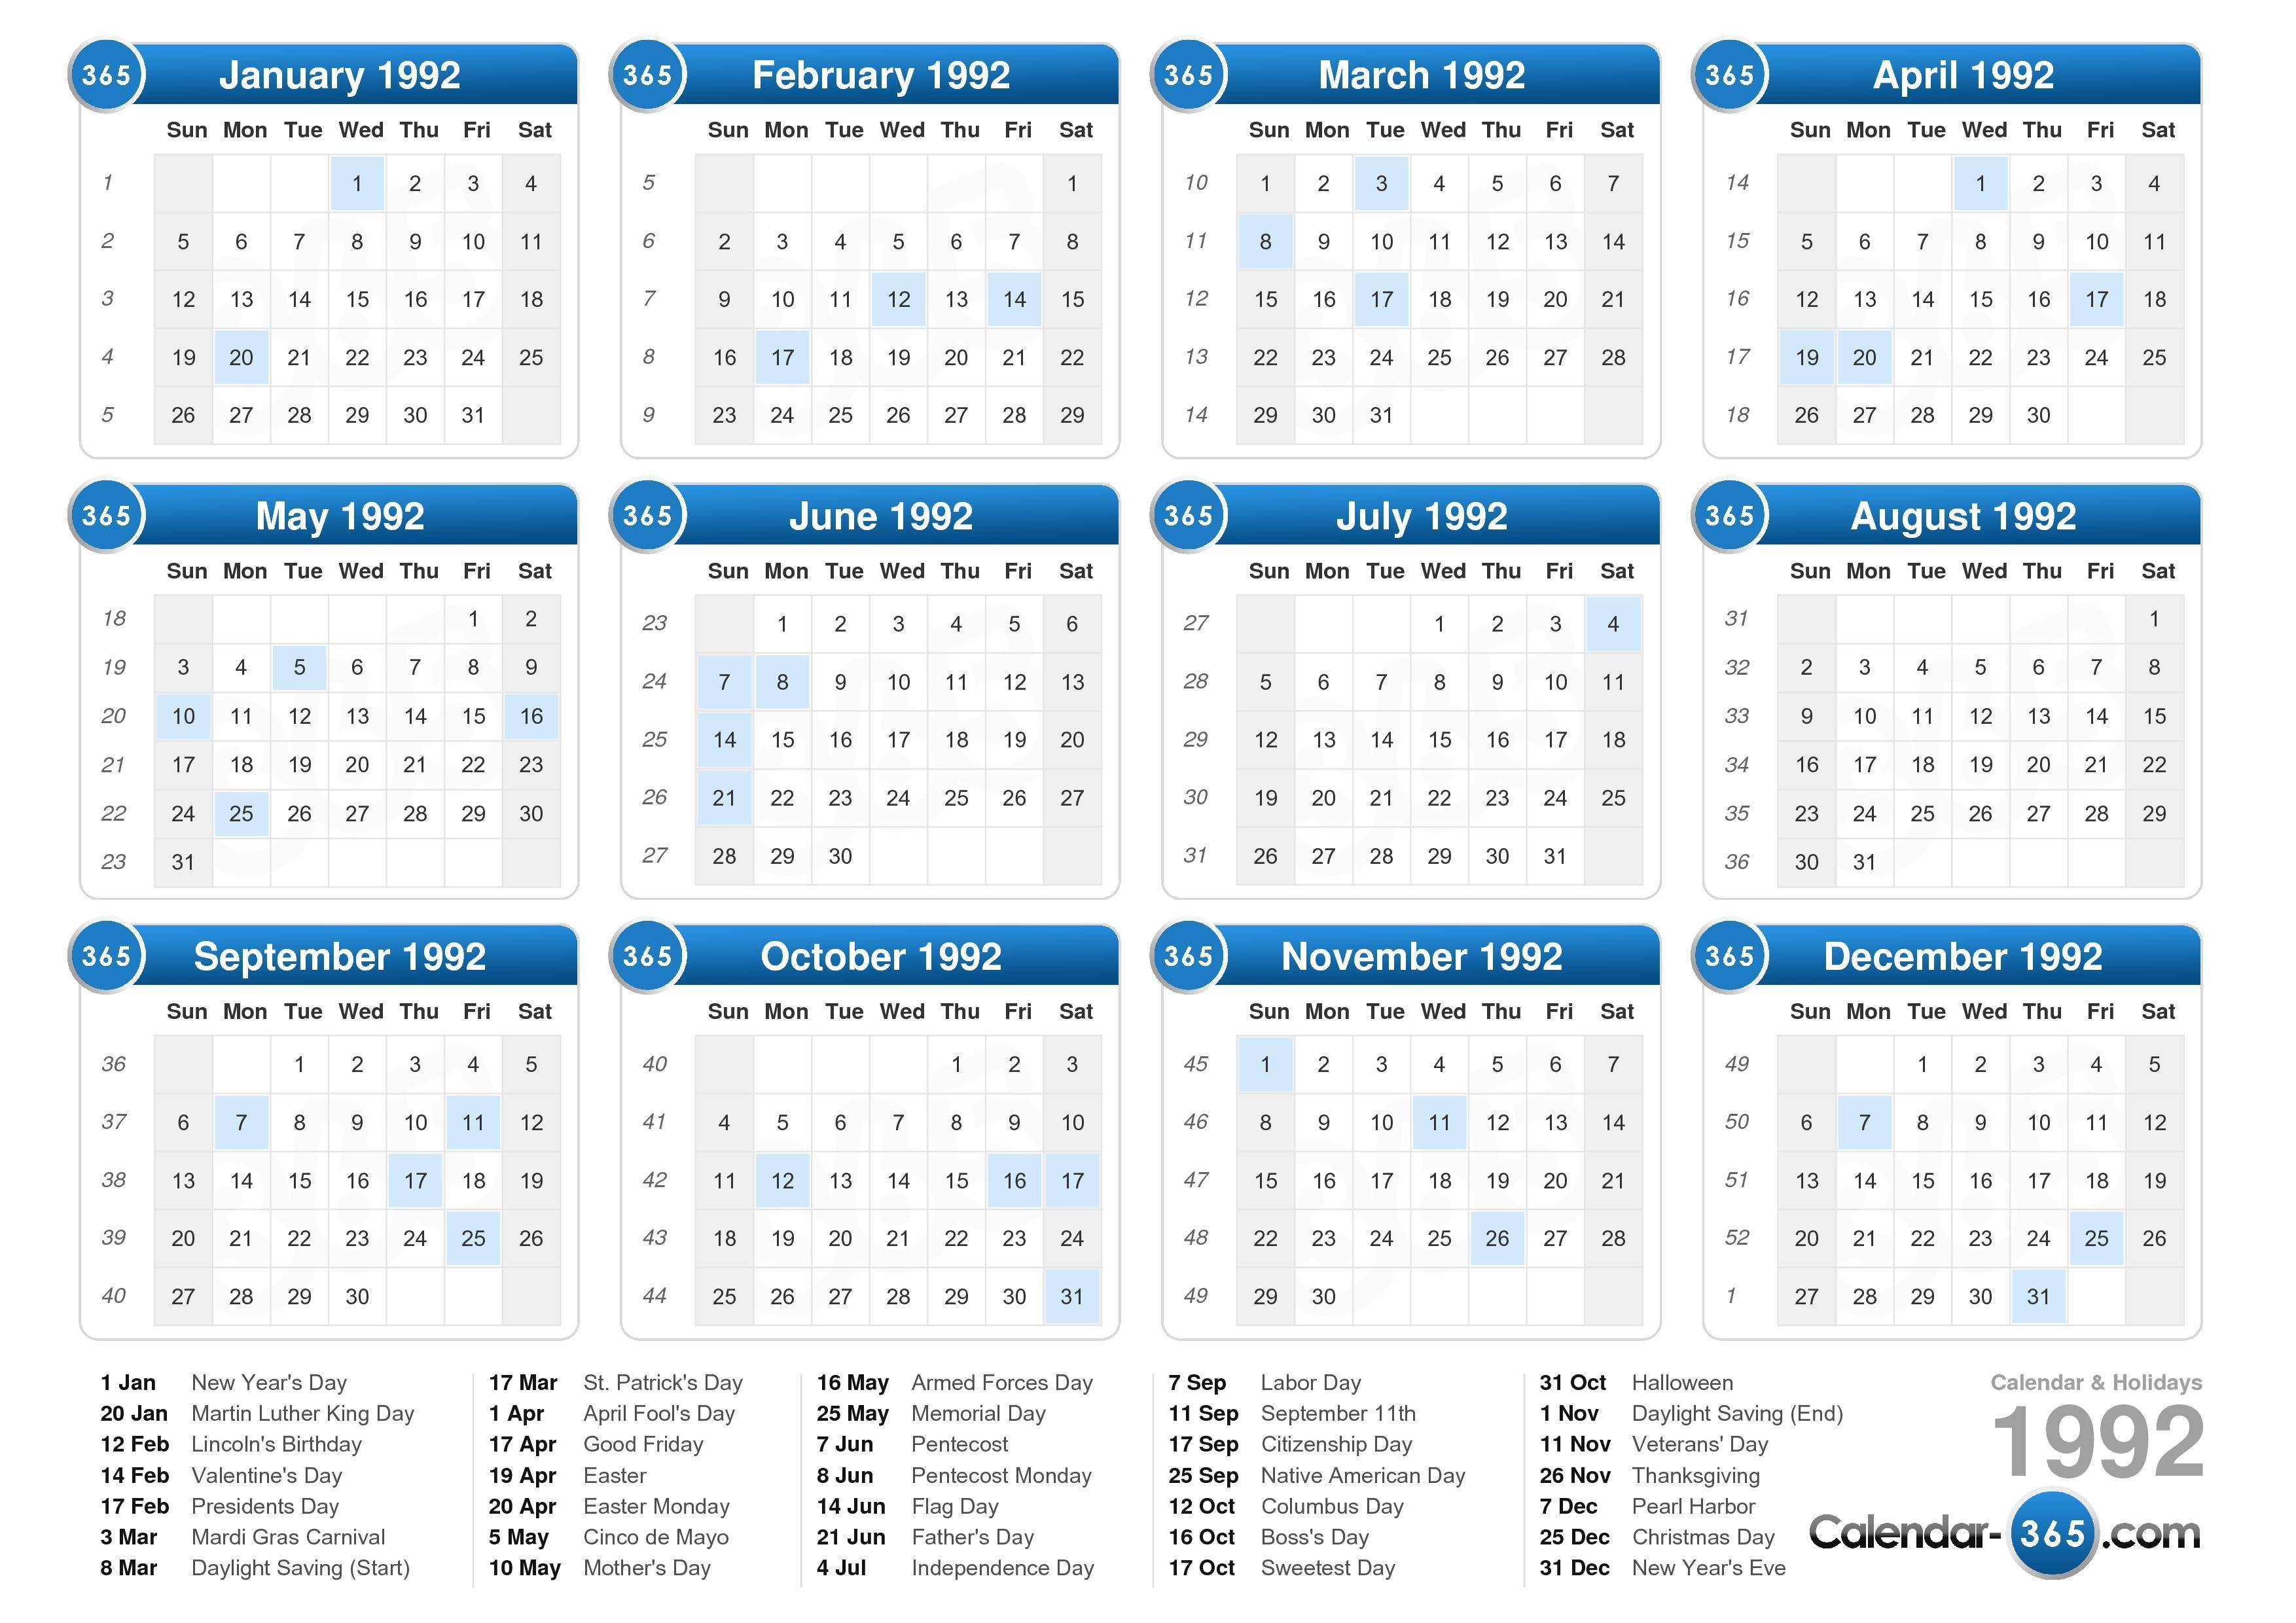 1992 calendar